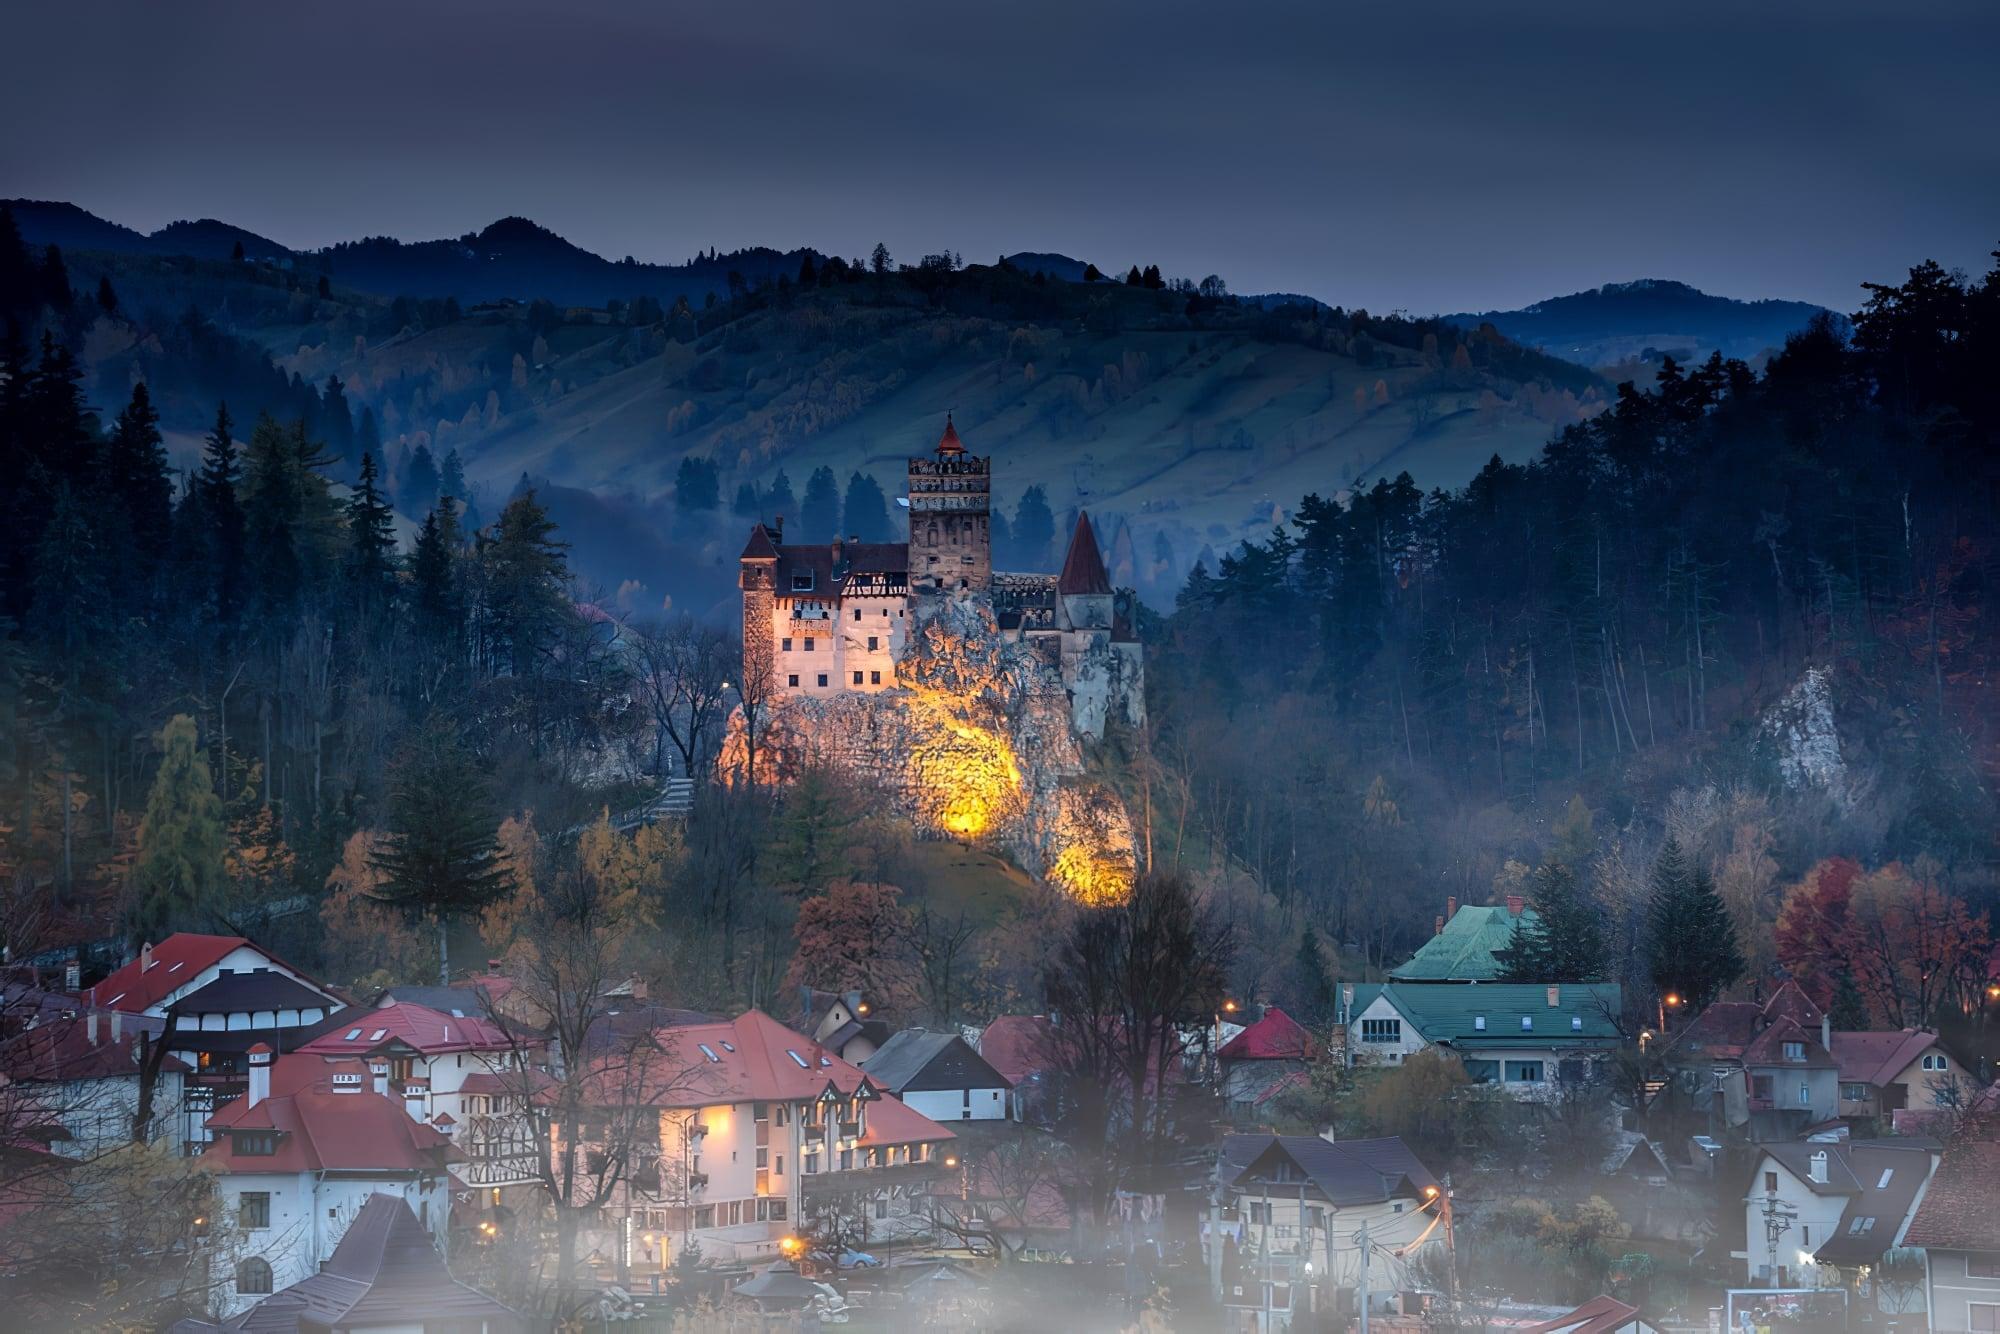 La Transylvanie, voyage au coeur de l'oeuvre de Bram Stoker